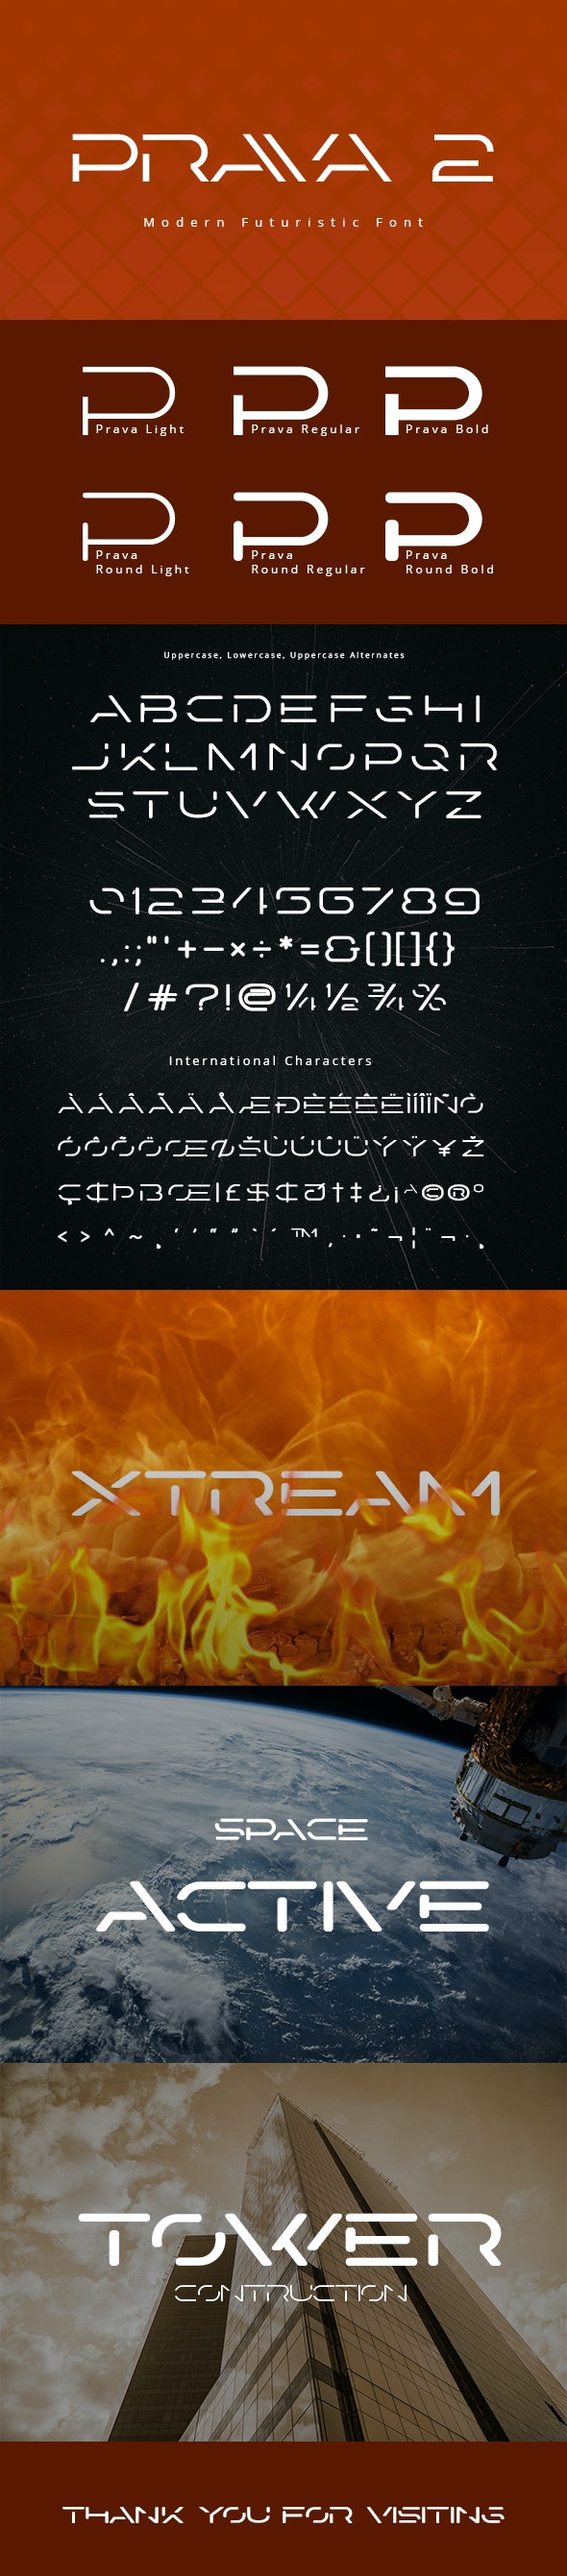 Prava 2 Display Font - Futuristic Decorative